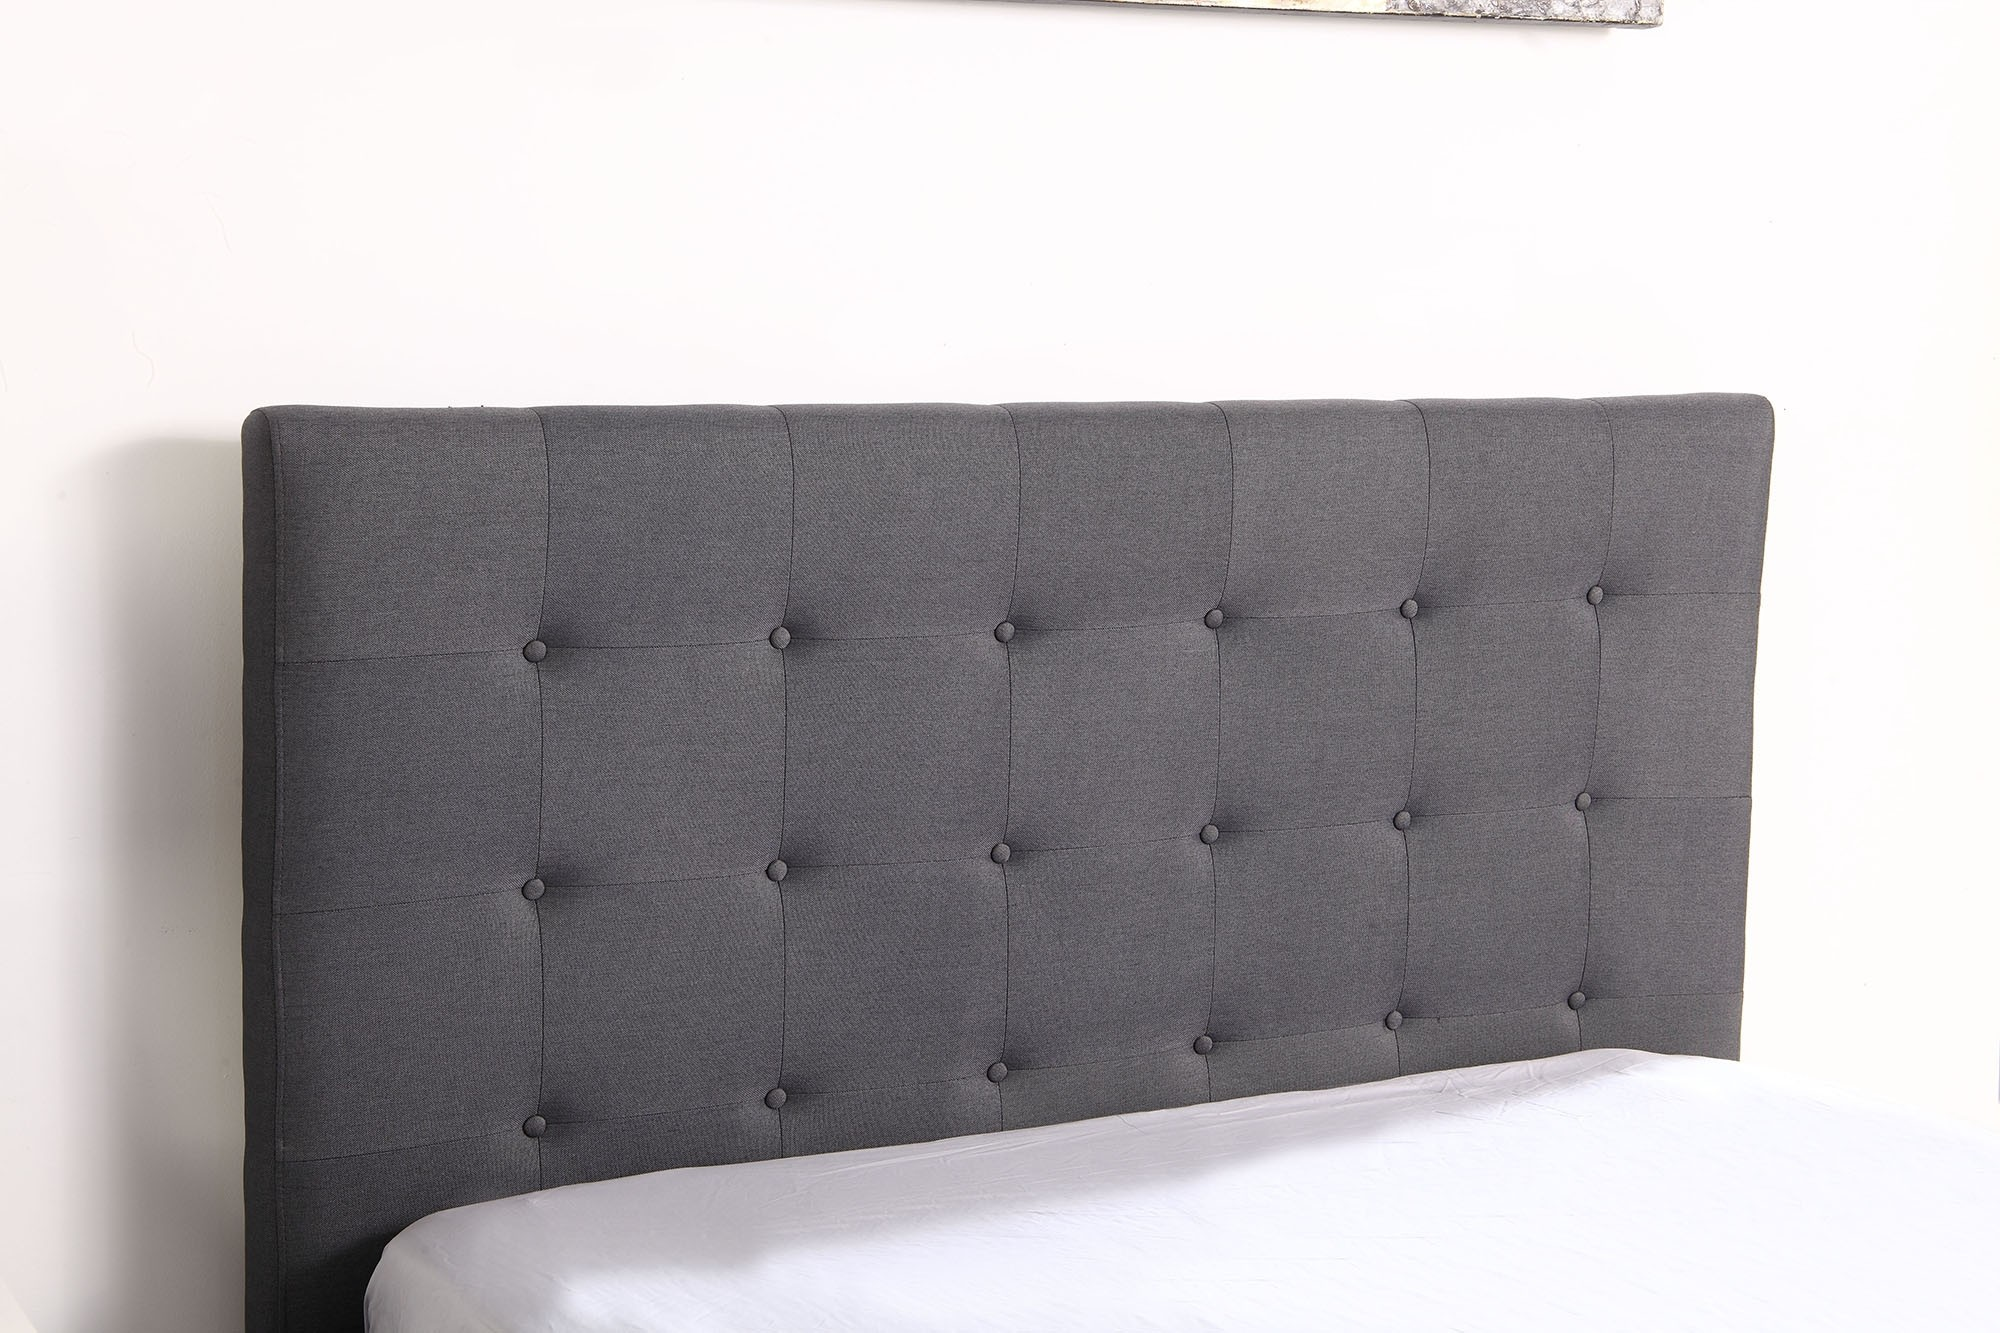 lit coffre layton sommier 160cm tissu gris. Black Bedroom Furniture Sets. Home Design Ideas